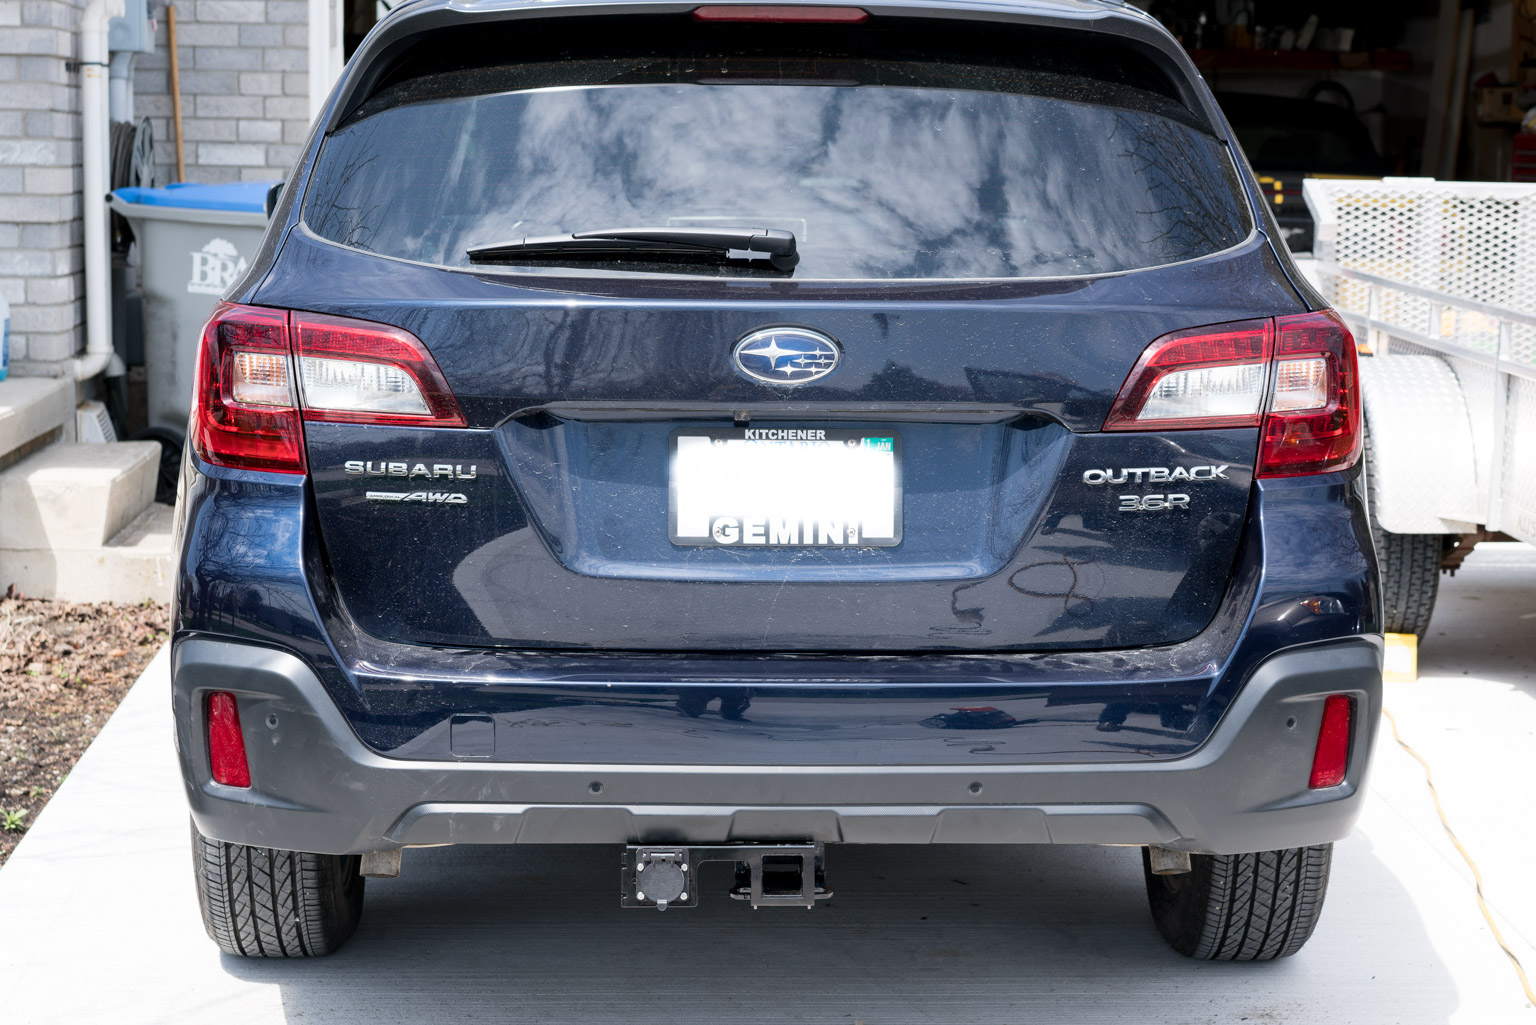 [SODI_2457]   trailer wiring harness | Subaru Outback Forums | 2017 Subaru Outback Trailer Wiring Harness |  | Subaru Outback.org